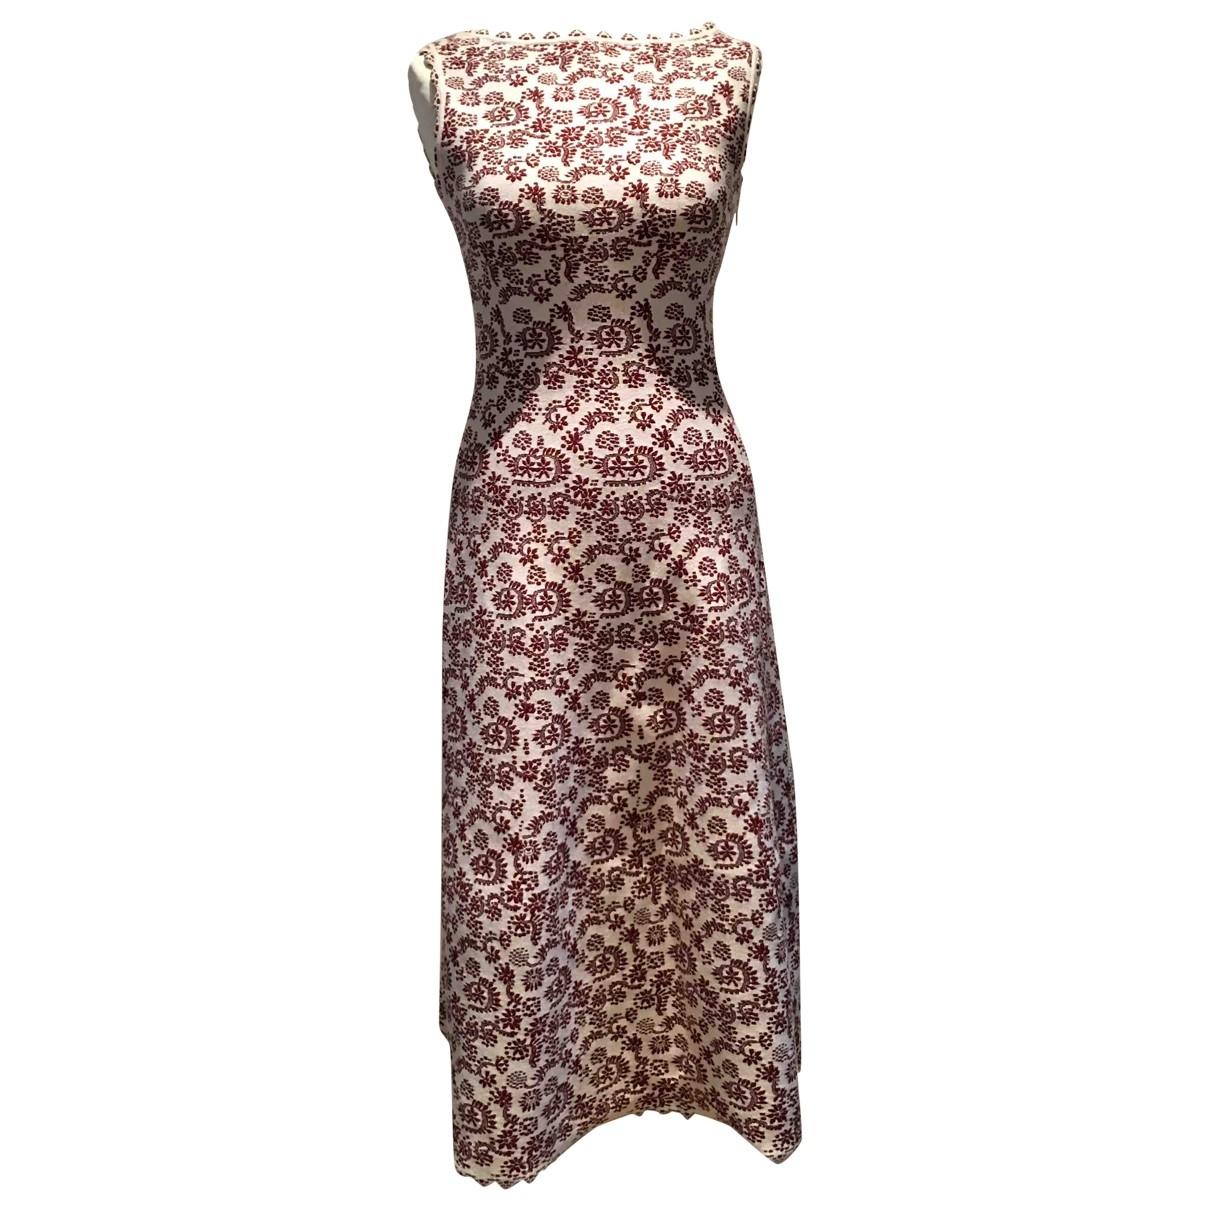 Alaia \N Kleid in  Weiss Wolle